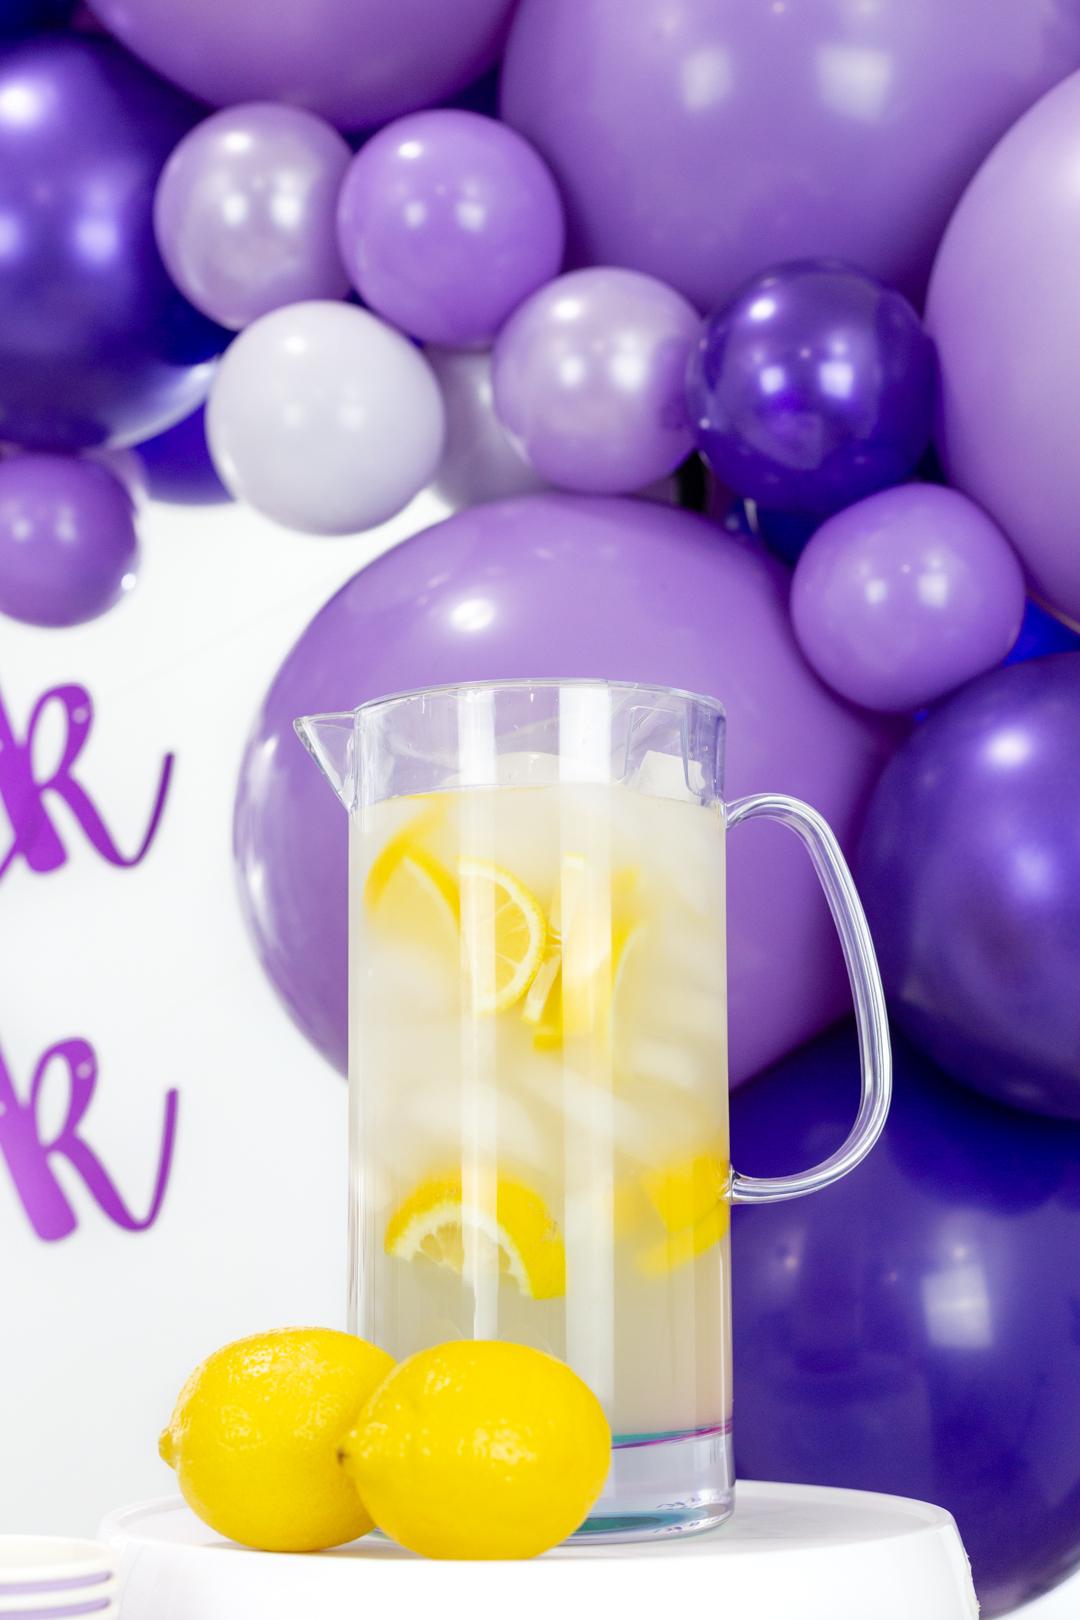 pitcher of lemonade with fresh lemon slices